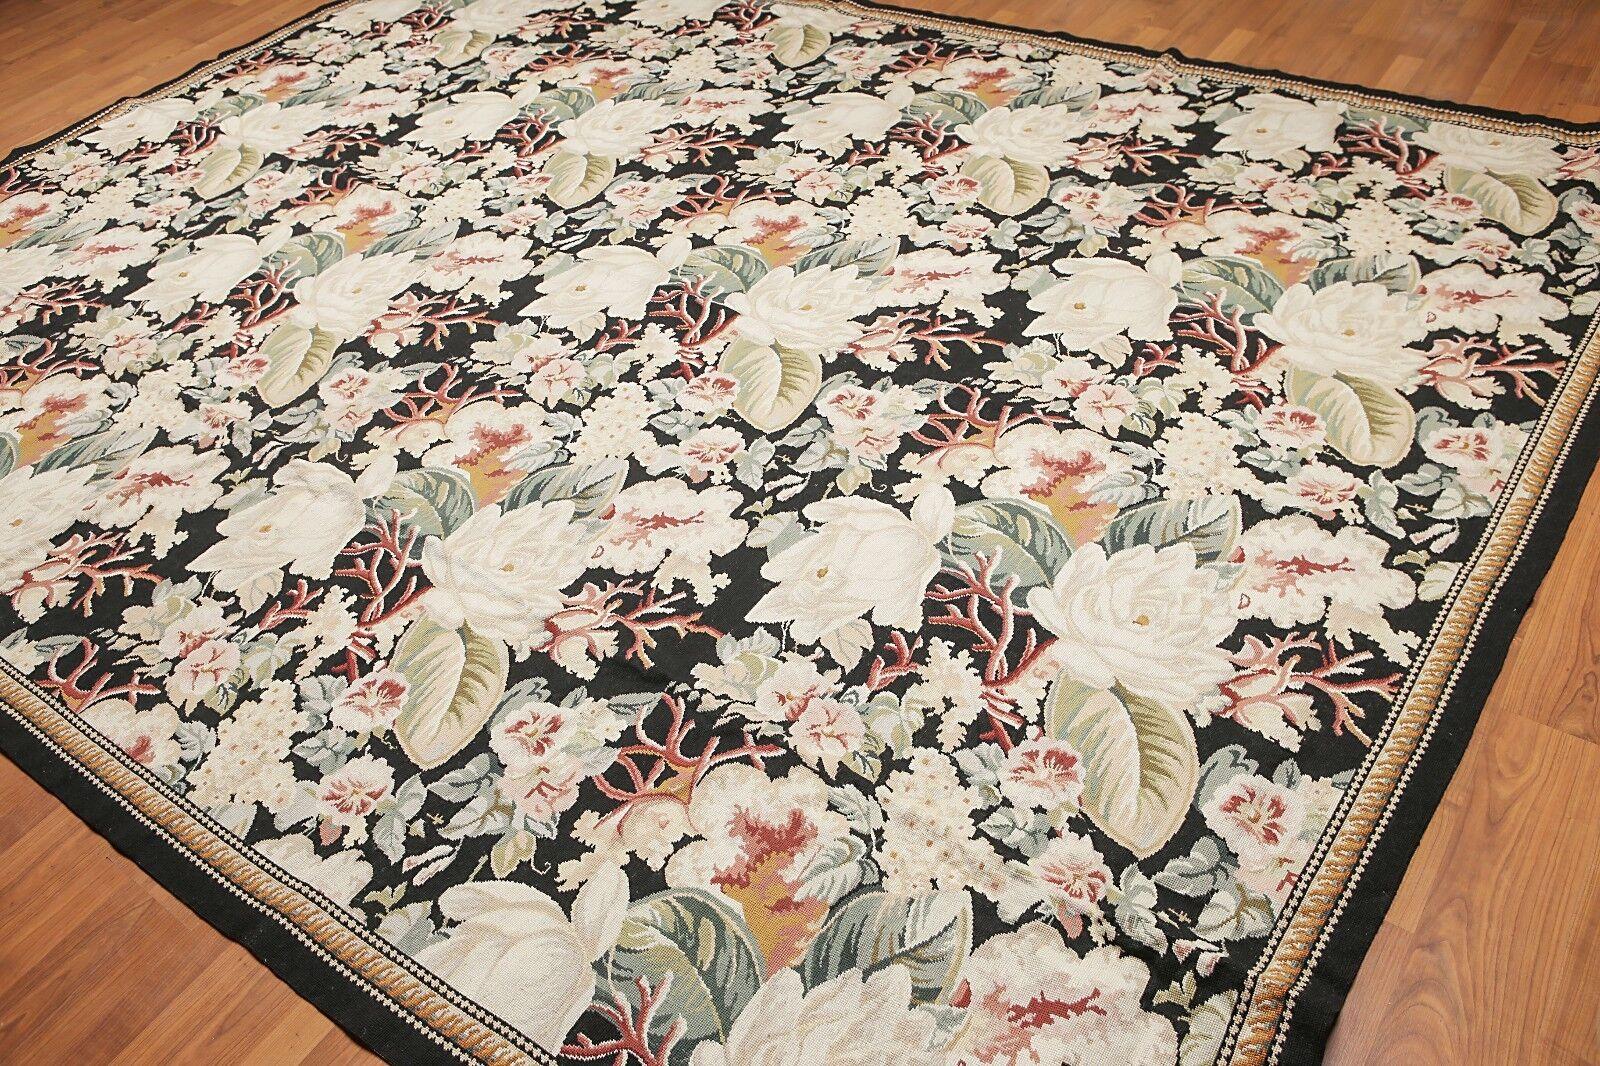 9' x 12' Asmara Hand woven Wool French Needlepoint Oriental